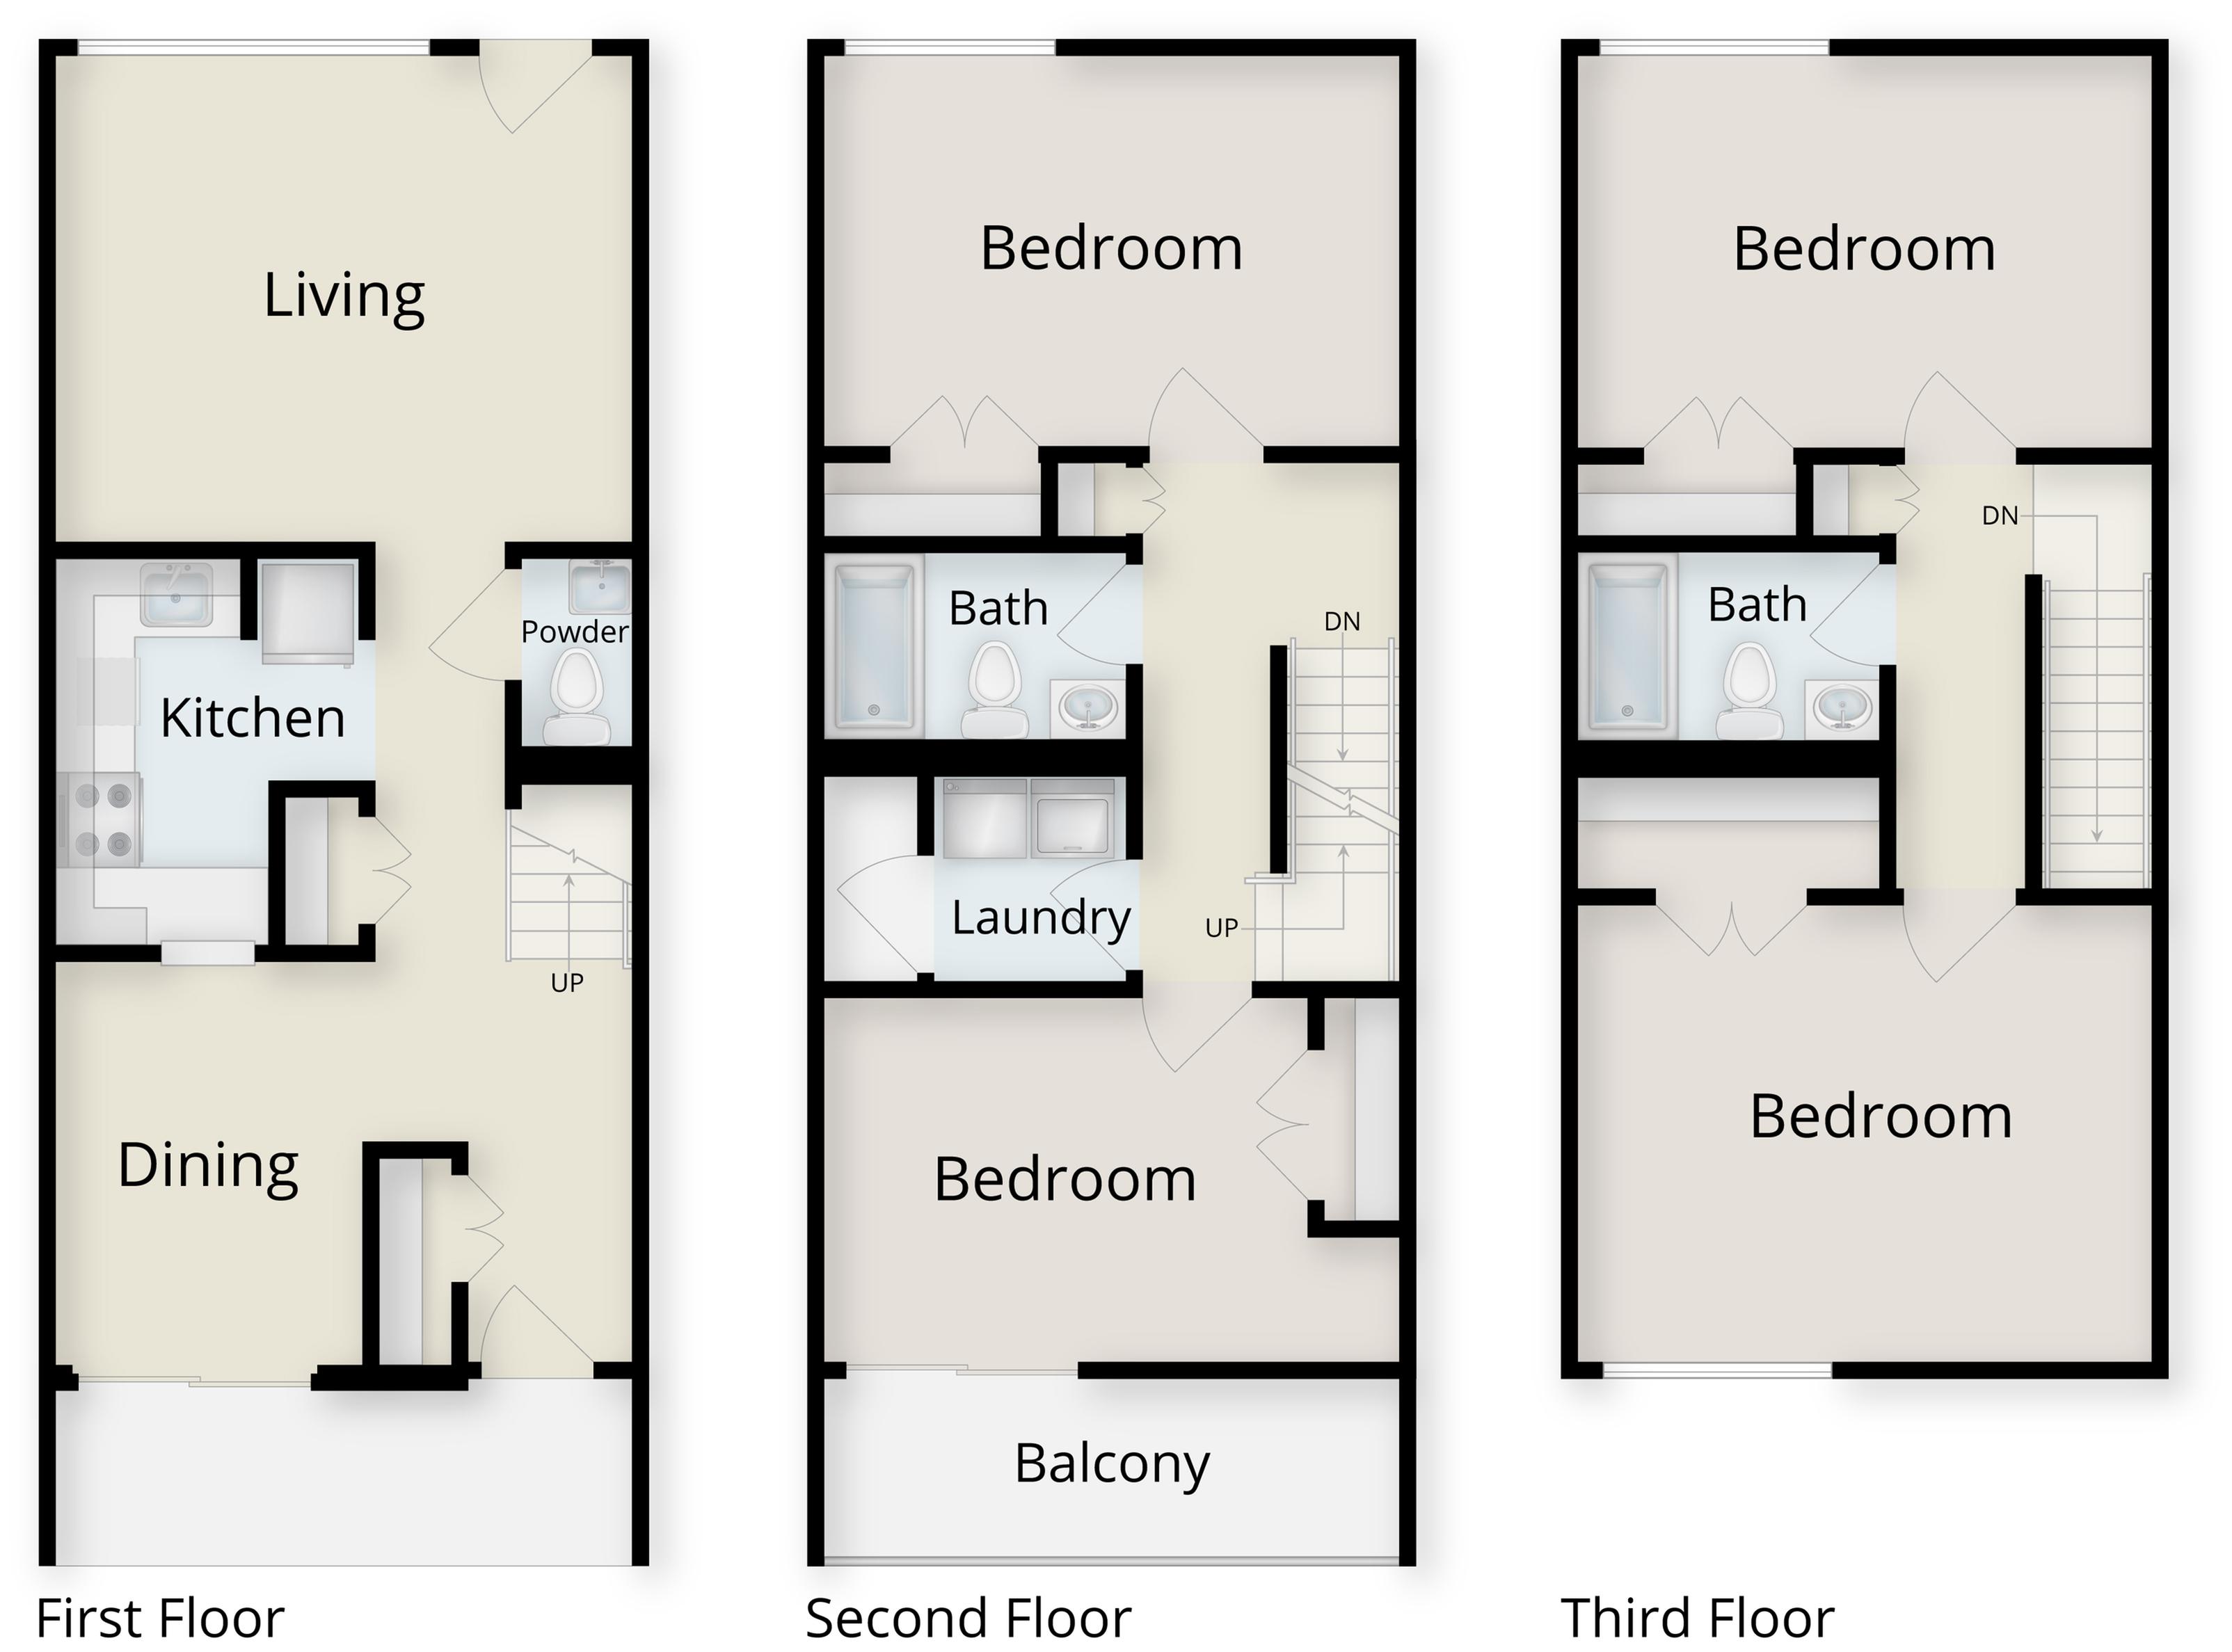 4 Bed / 2.5 Bath Apartment in Brookline MA | Village at Brookline